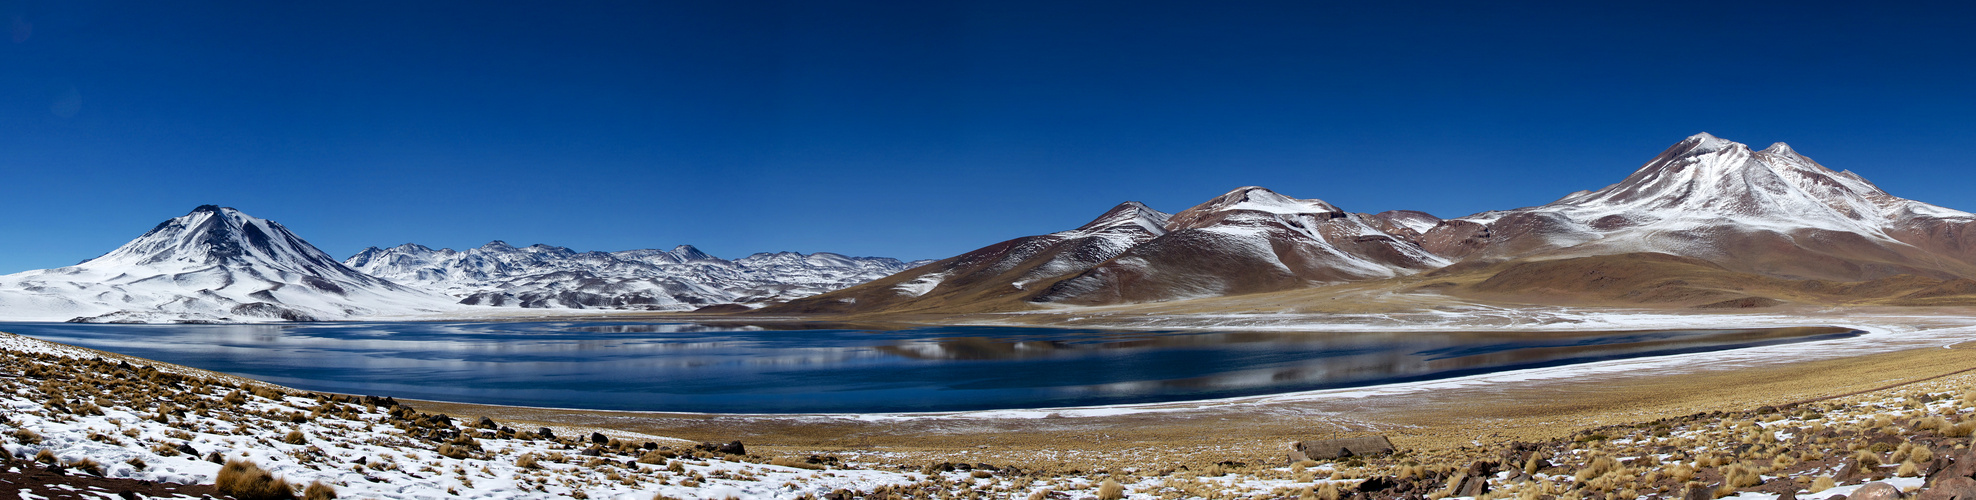 Winter at Atacama Desert Chile - Laguna Miscanti